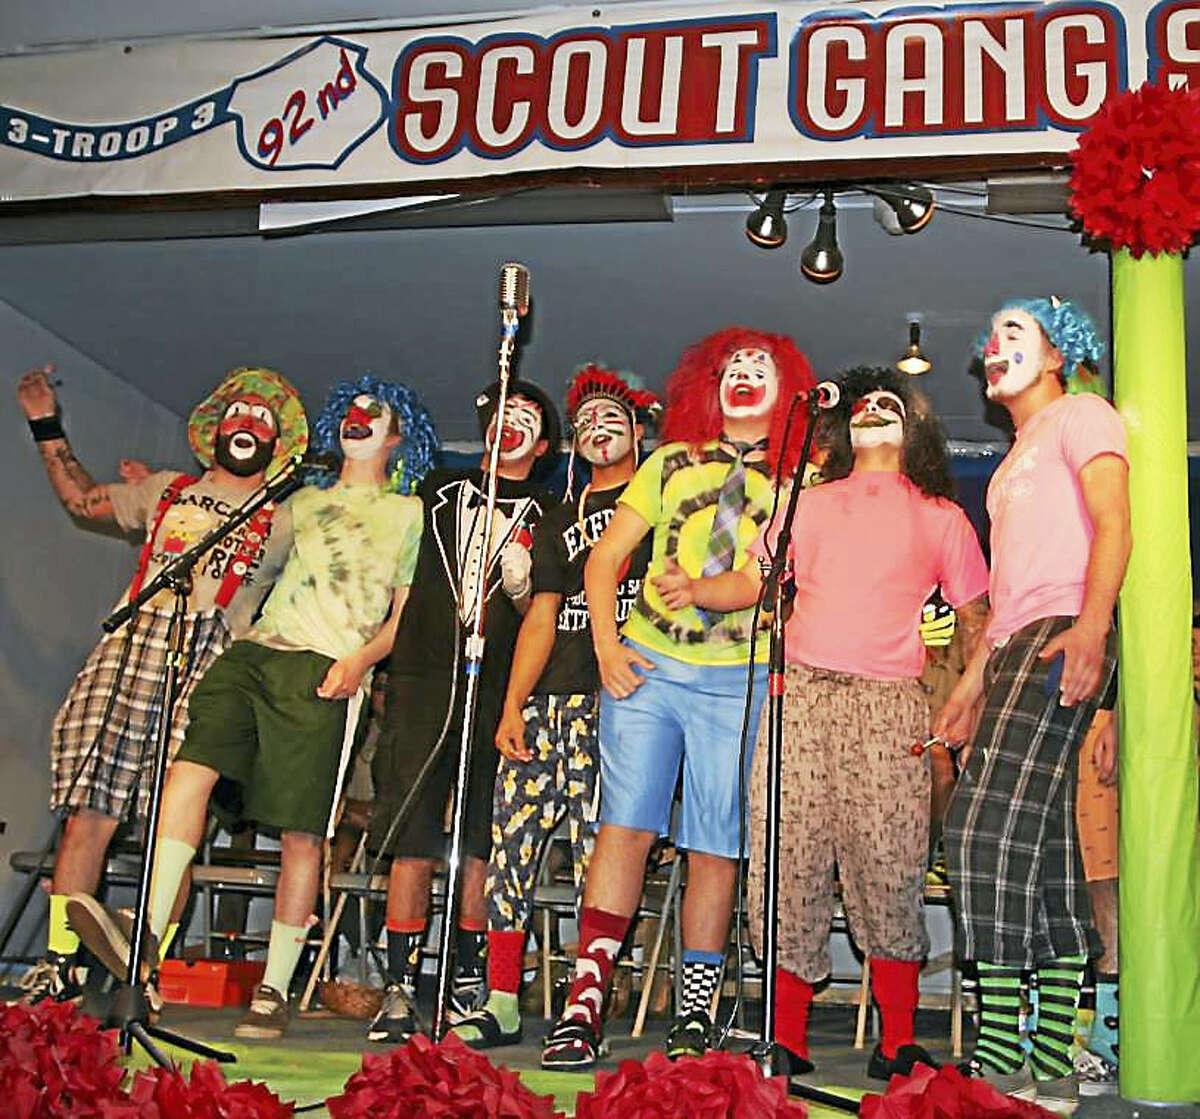 Left to right are 2016 Gang Show Endmen Mike McMahon, Jason Edwards, Ben Grasso, Naveen Madivala, Joe Szewczyk, James Chopak and Billy Kowarik.